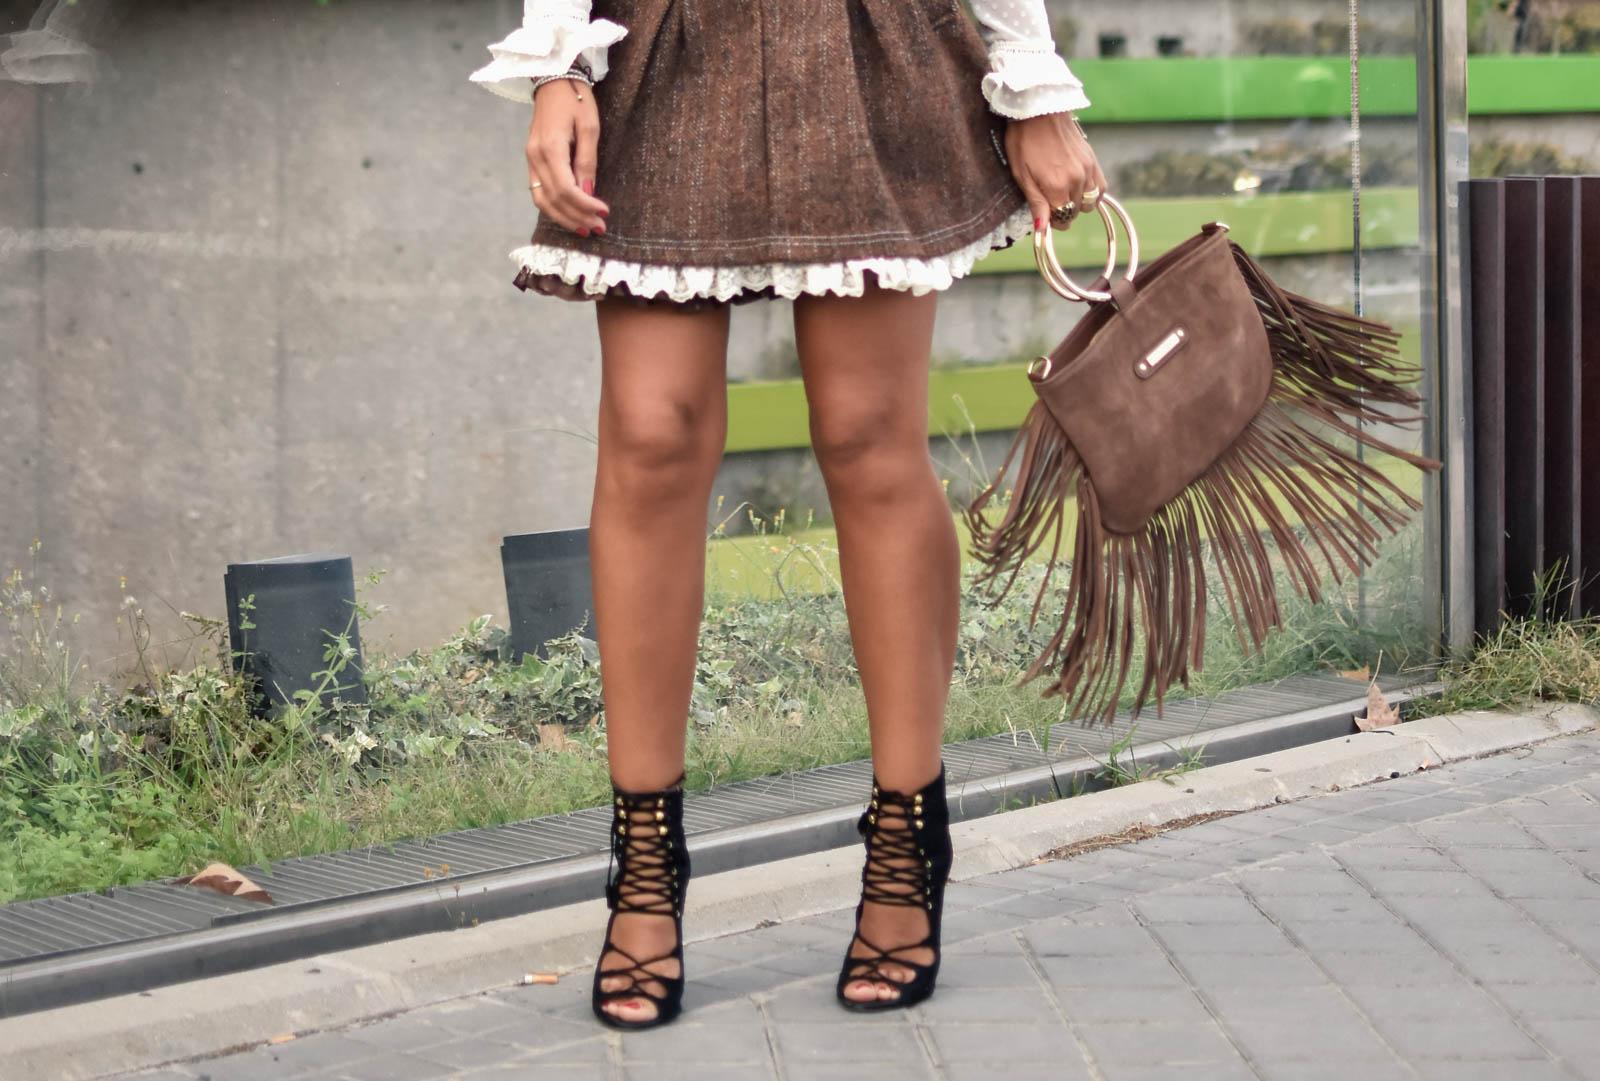 el-blog-de-silvia-rodriguez-street-style-madrid-desfile-highly-preppy-blusa-plumeti-minifalda-botines-carolina-herrera-blogger-influencer